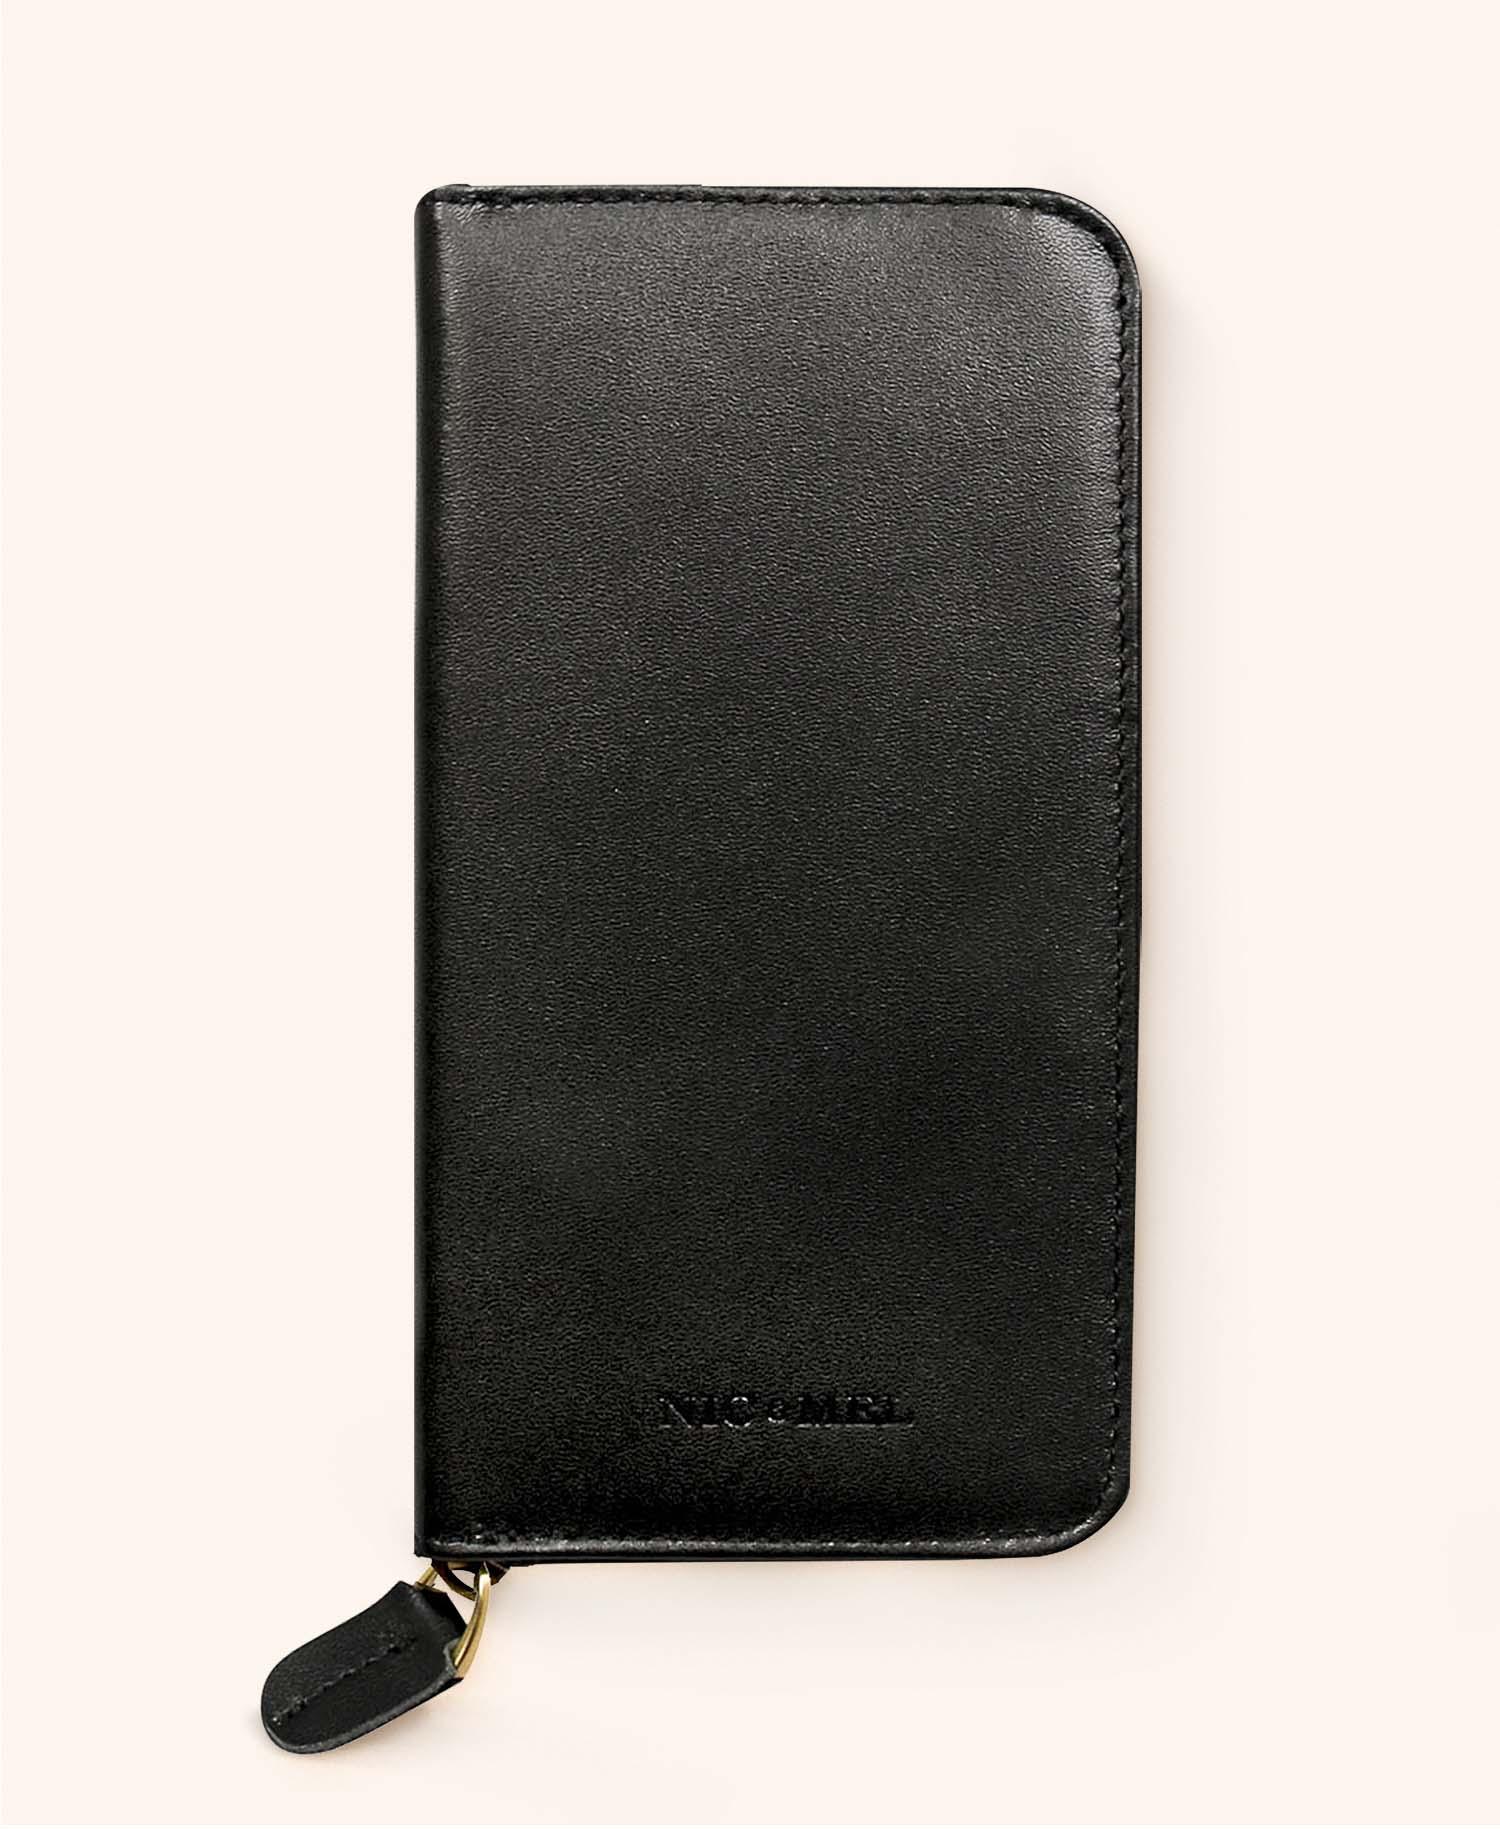 Greg black wallet iphone 11 Pro Max